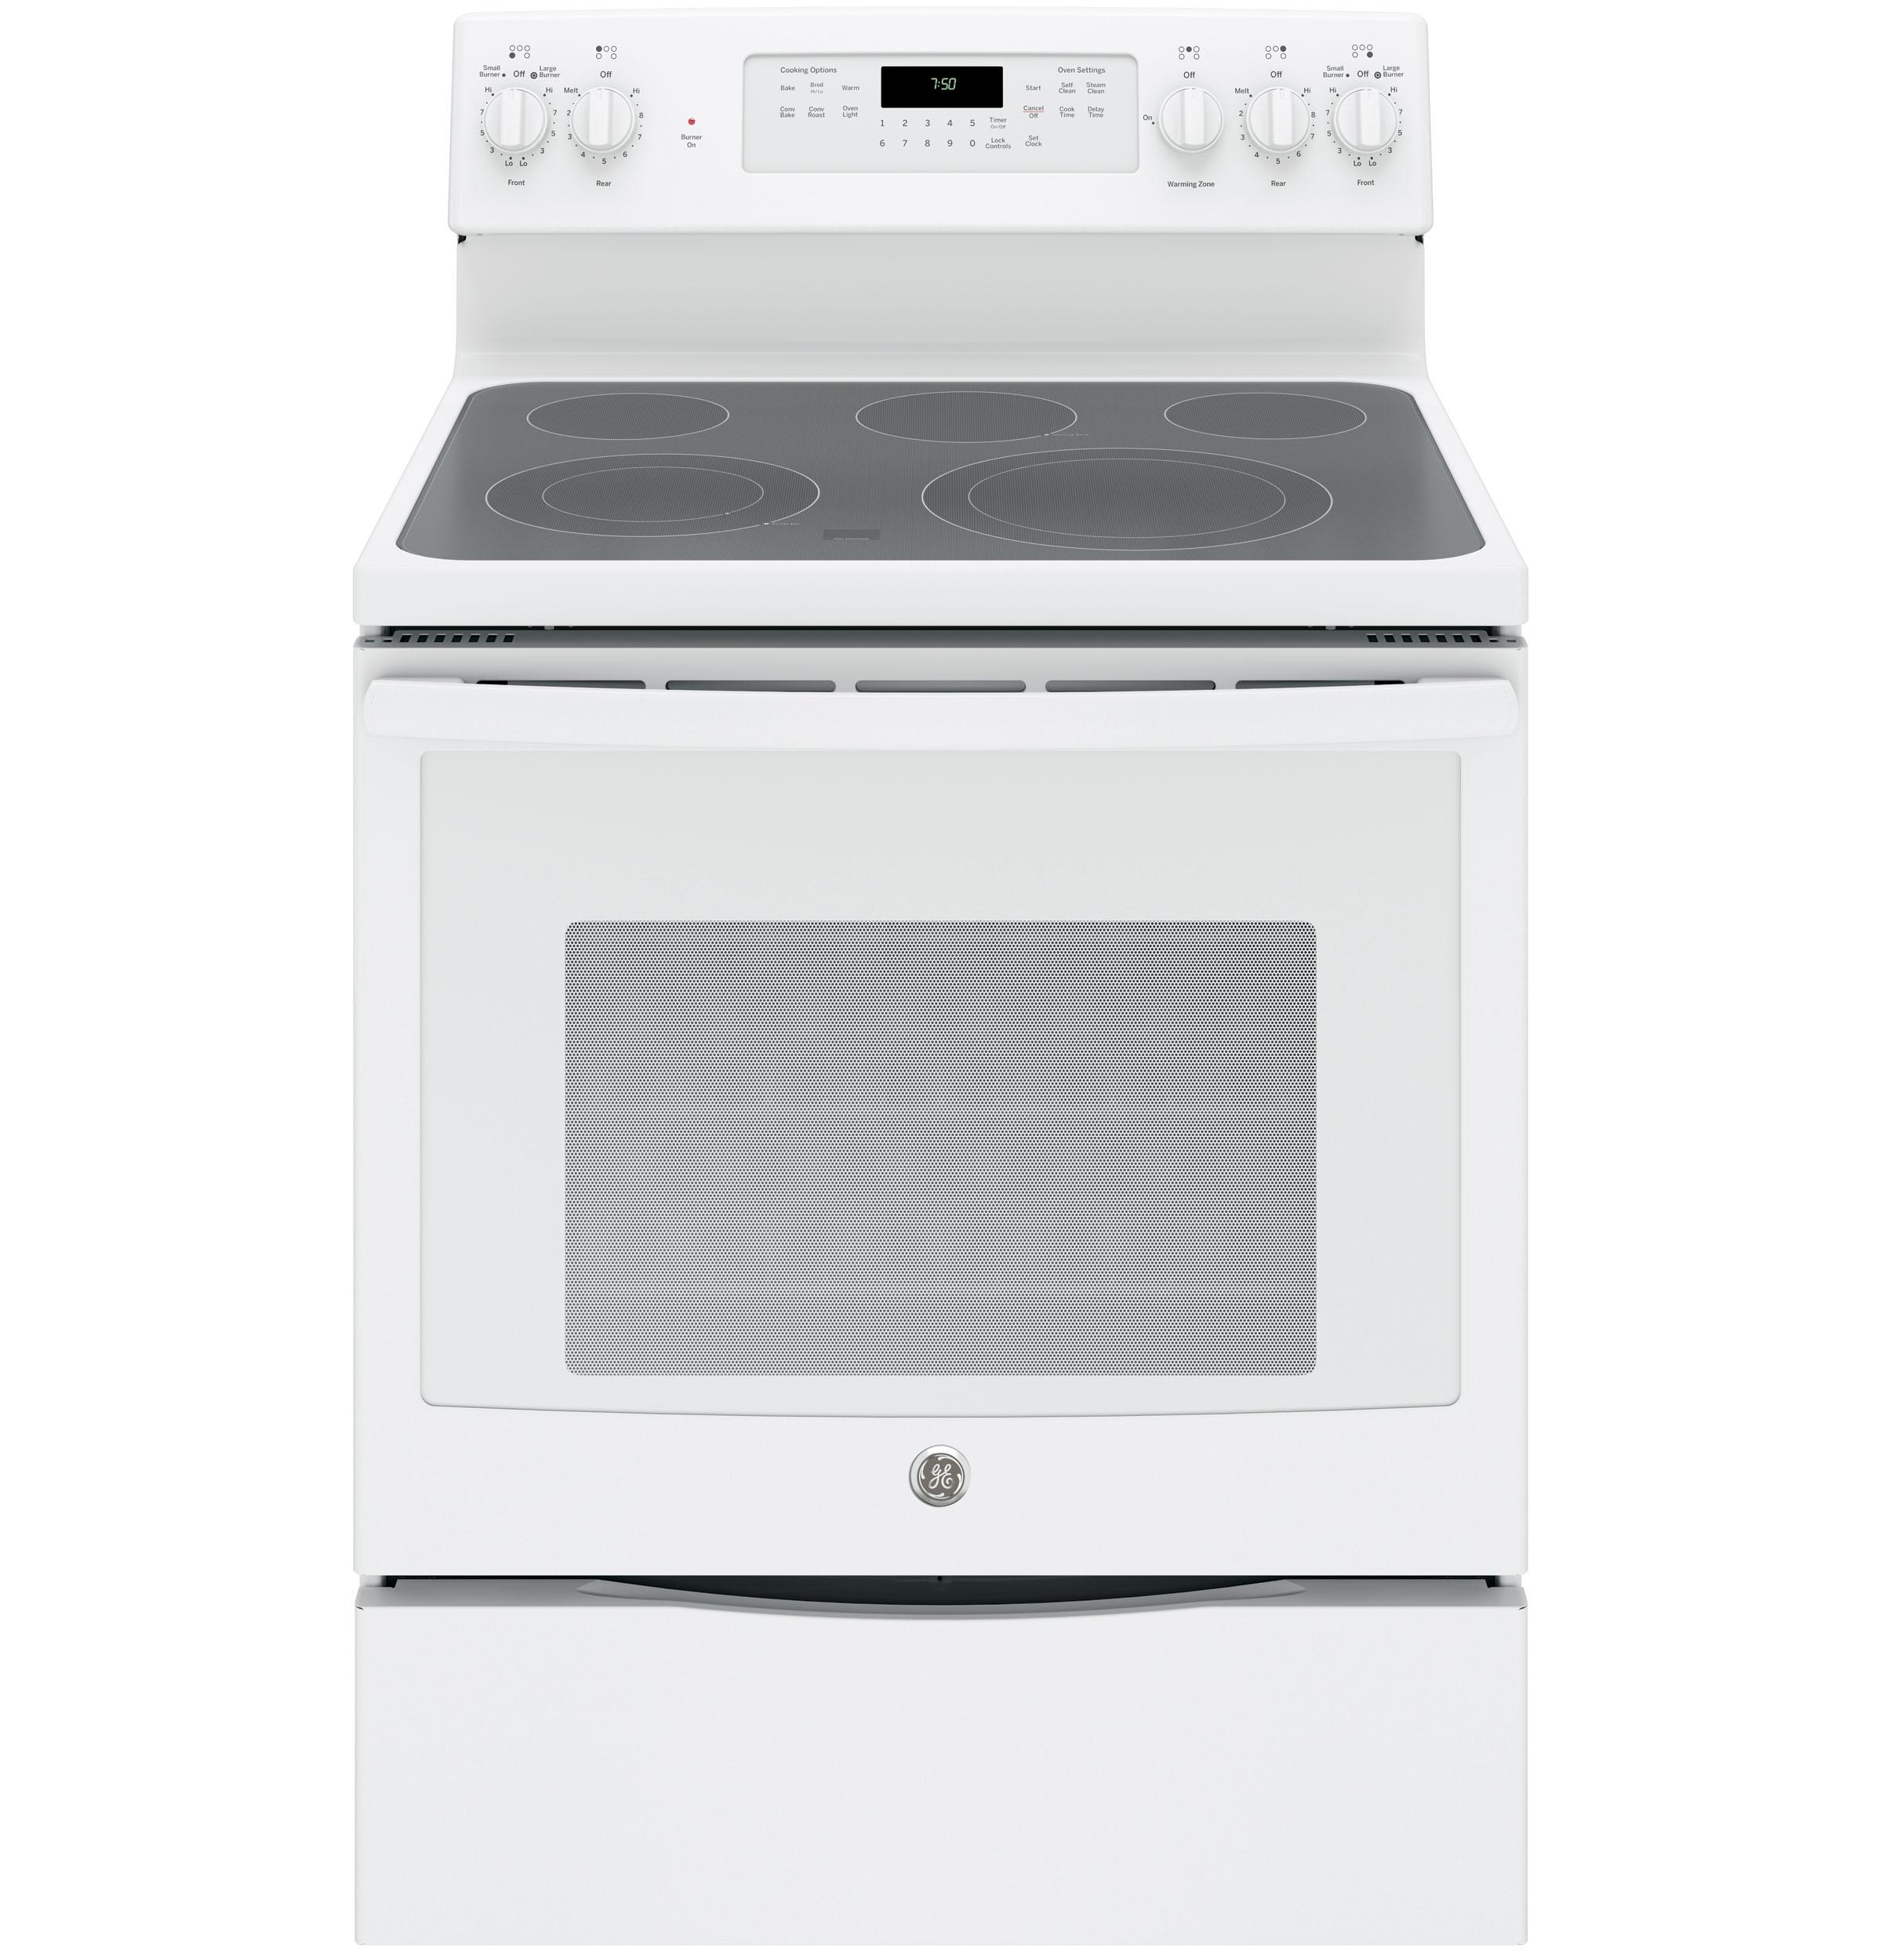 "GE Appliances GE Electric Ranges 30"" Electric Convection Range - Item Number: JB750DJWW"